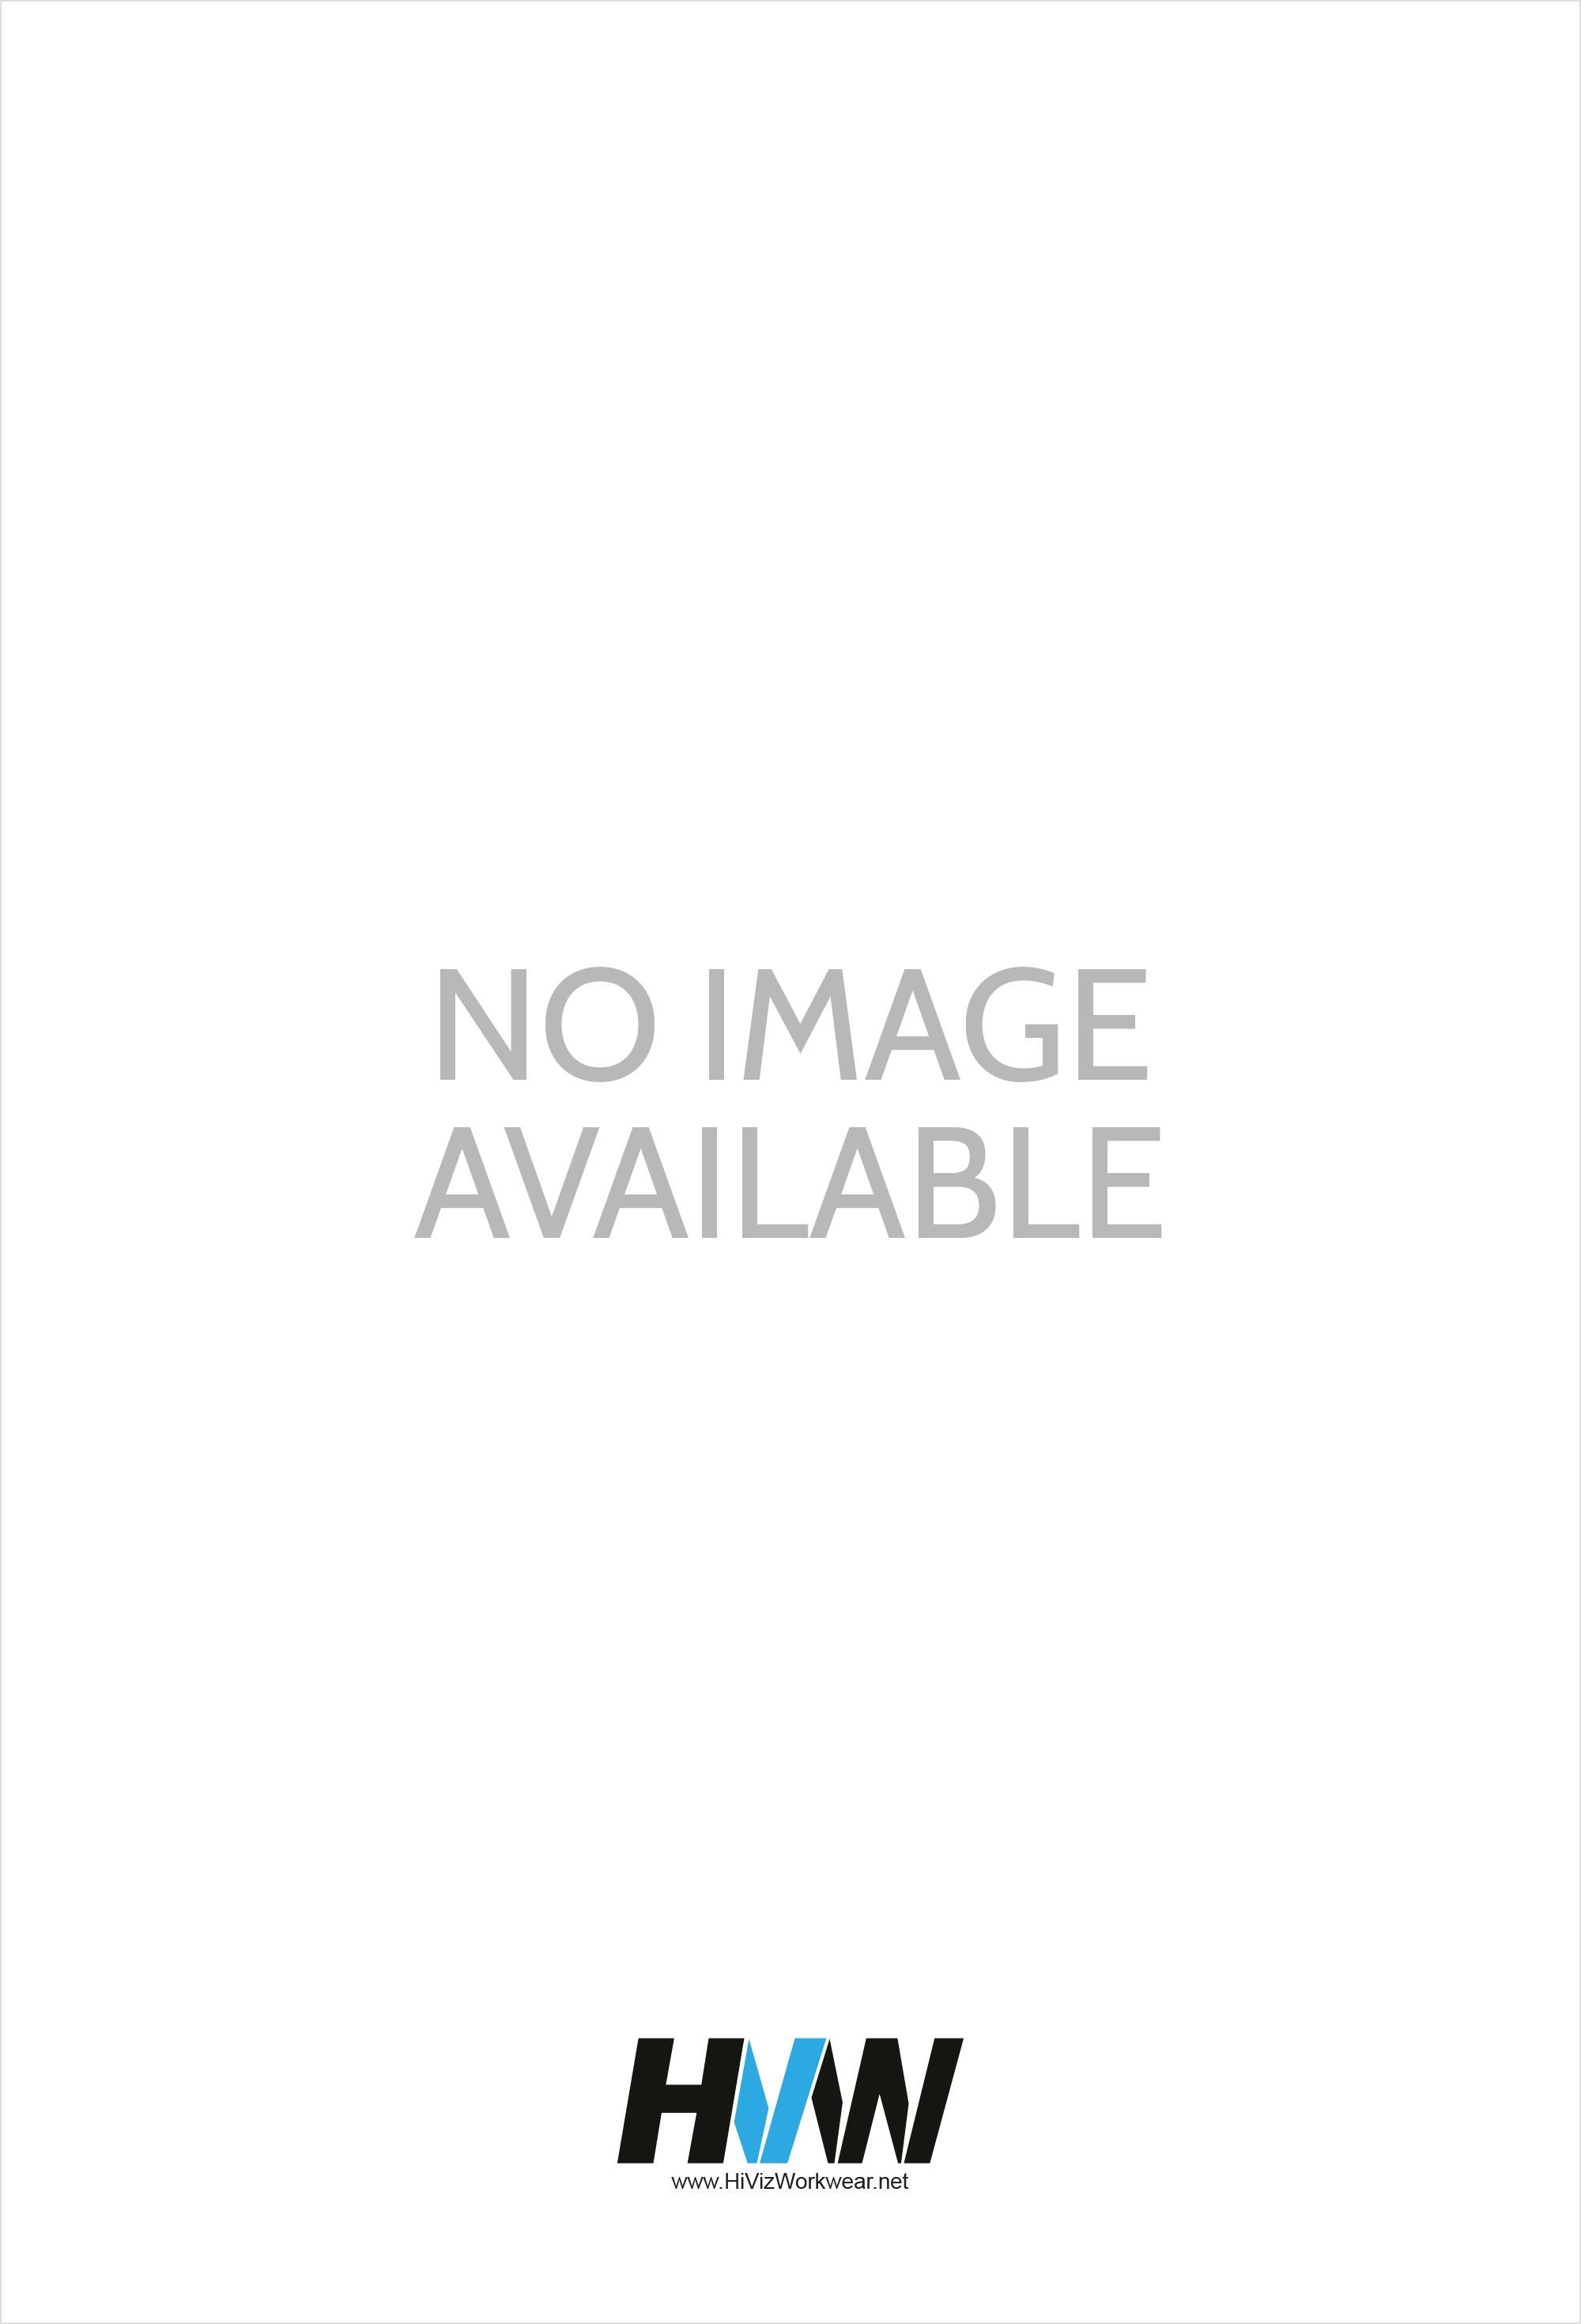 SS028 Long Sleeved BaseBall T-Shirt (Small To 2XL)